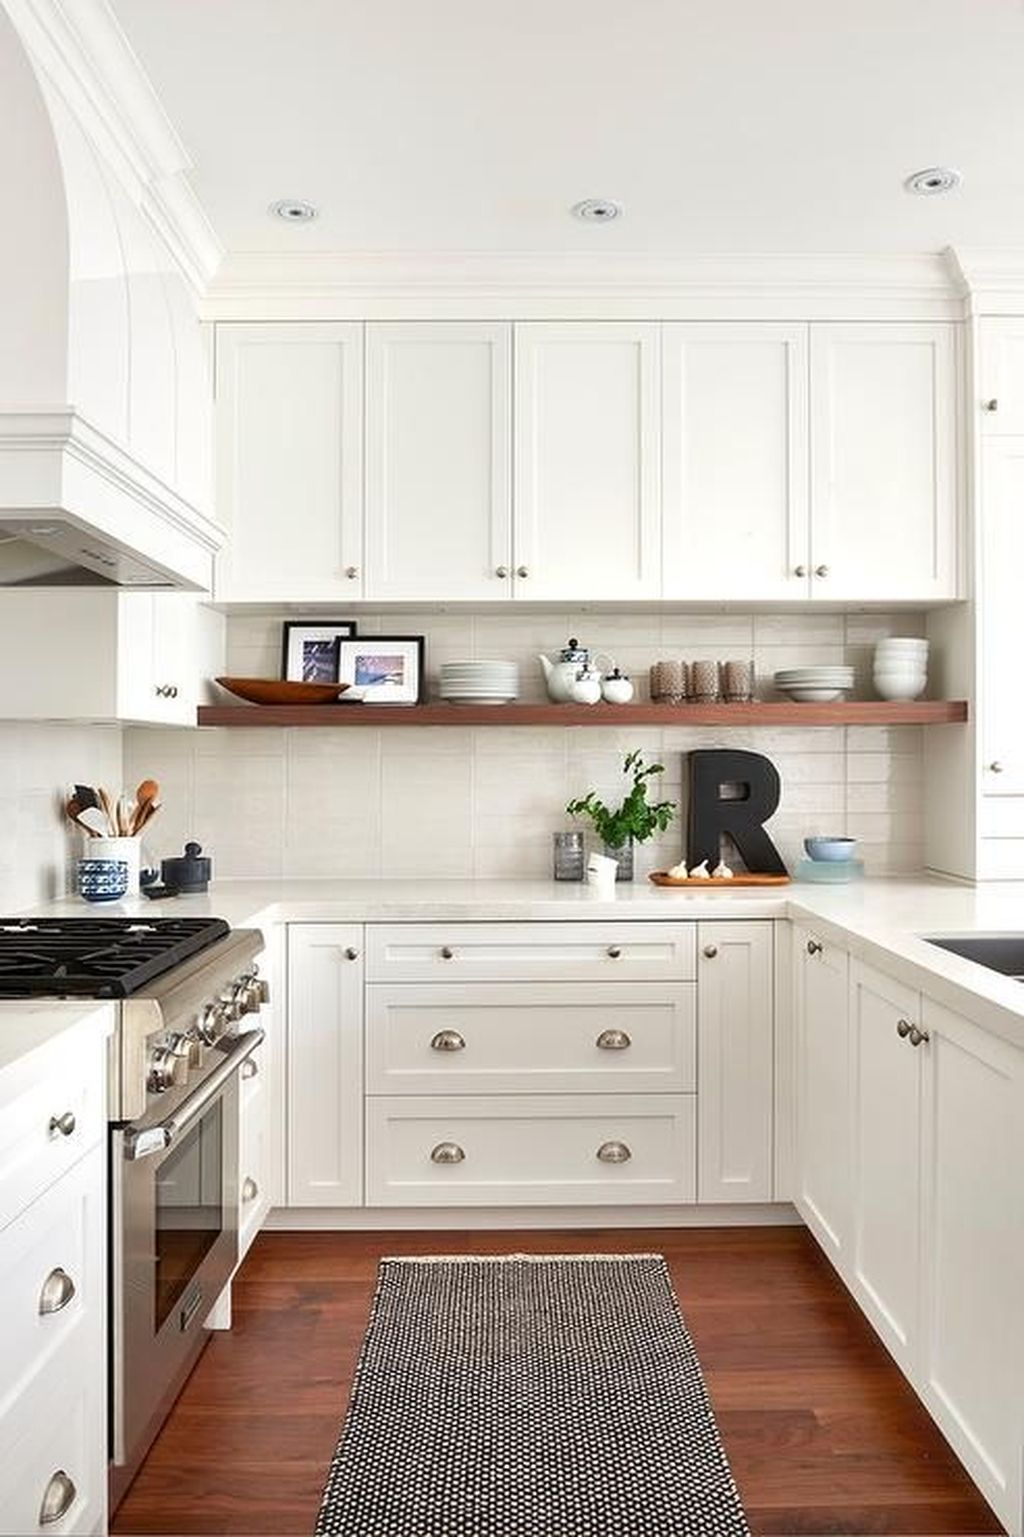 30 stylish u shaped kitchen remodel ideas in 2020 white shaker kitchen kitchen layout new on kitchen ideas u shaped layout id=94569